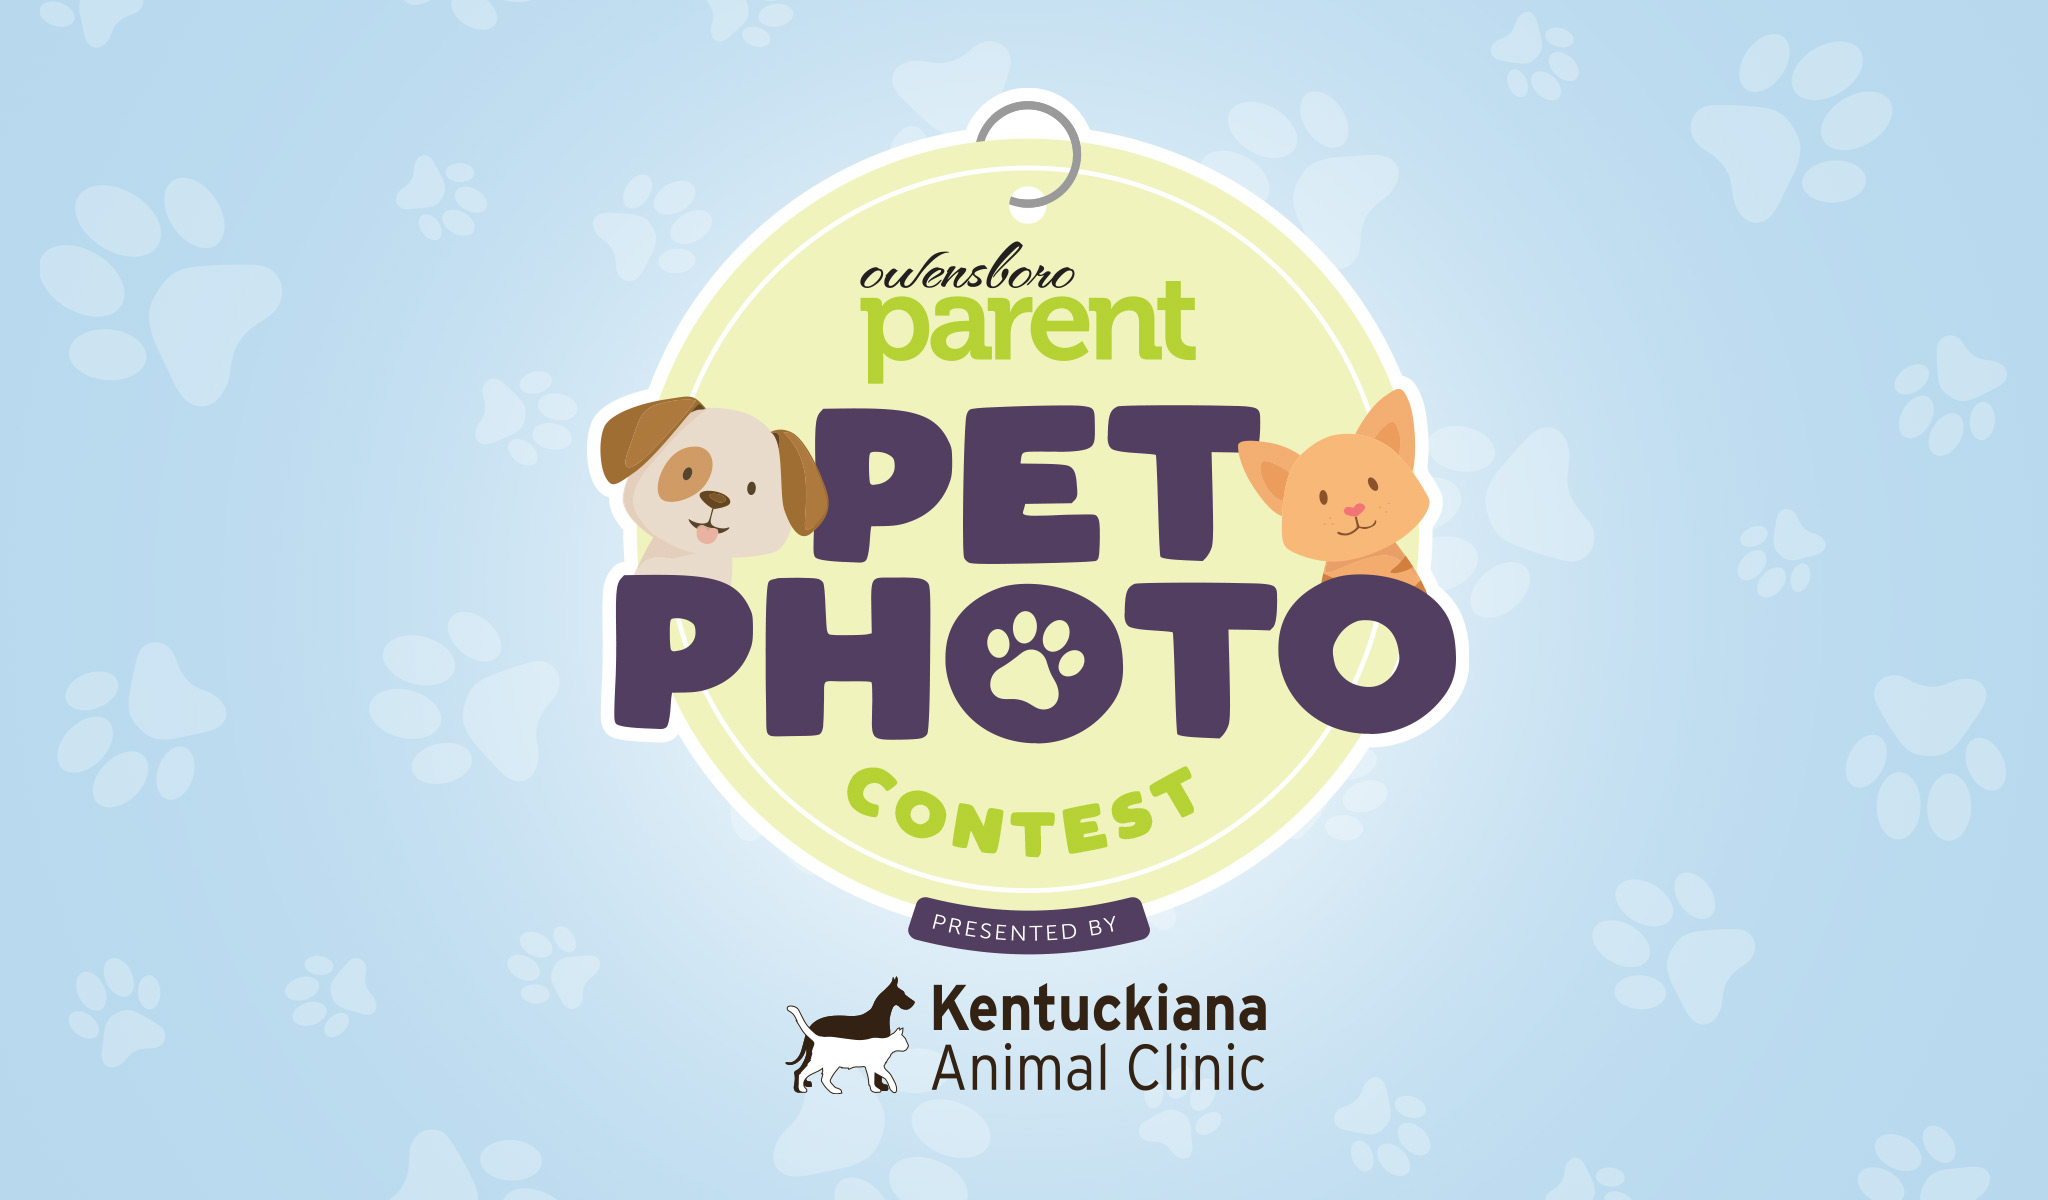 Owensboro Parent Pet Photo Contest Logo